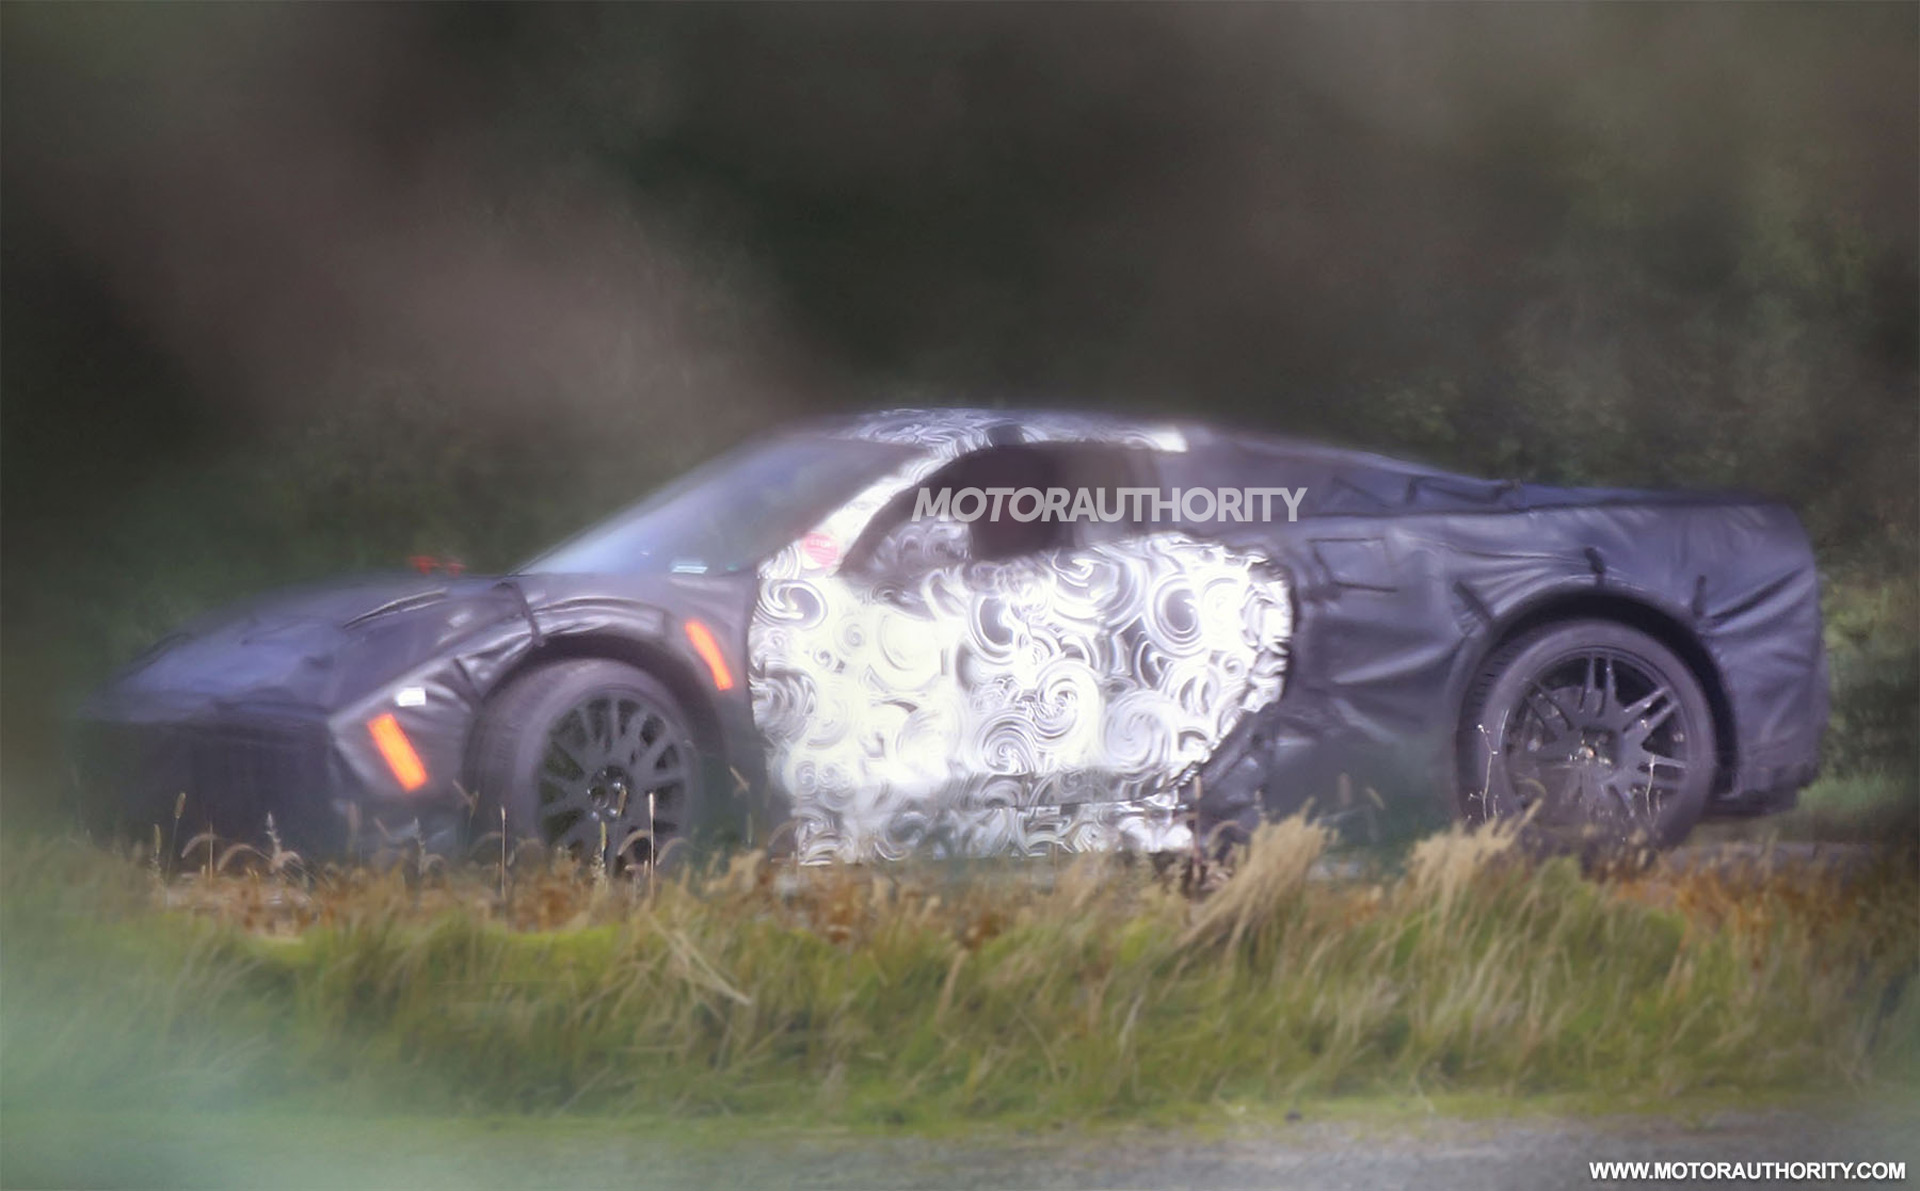 2019 Chevrolet Corvette (C8) spy shots